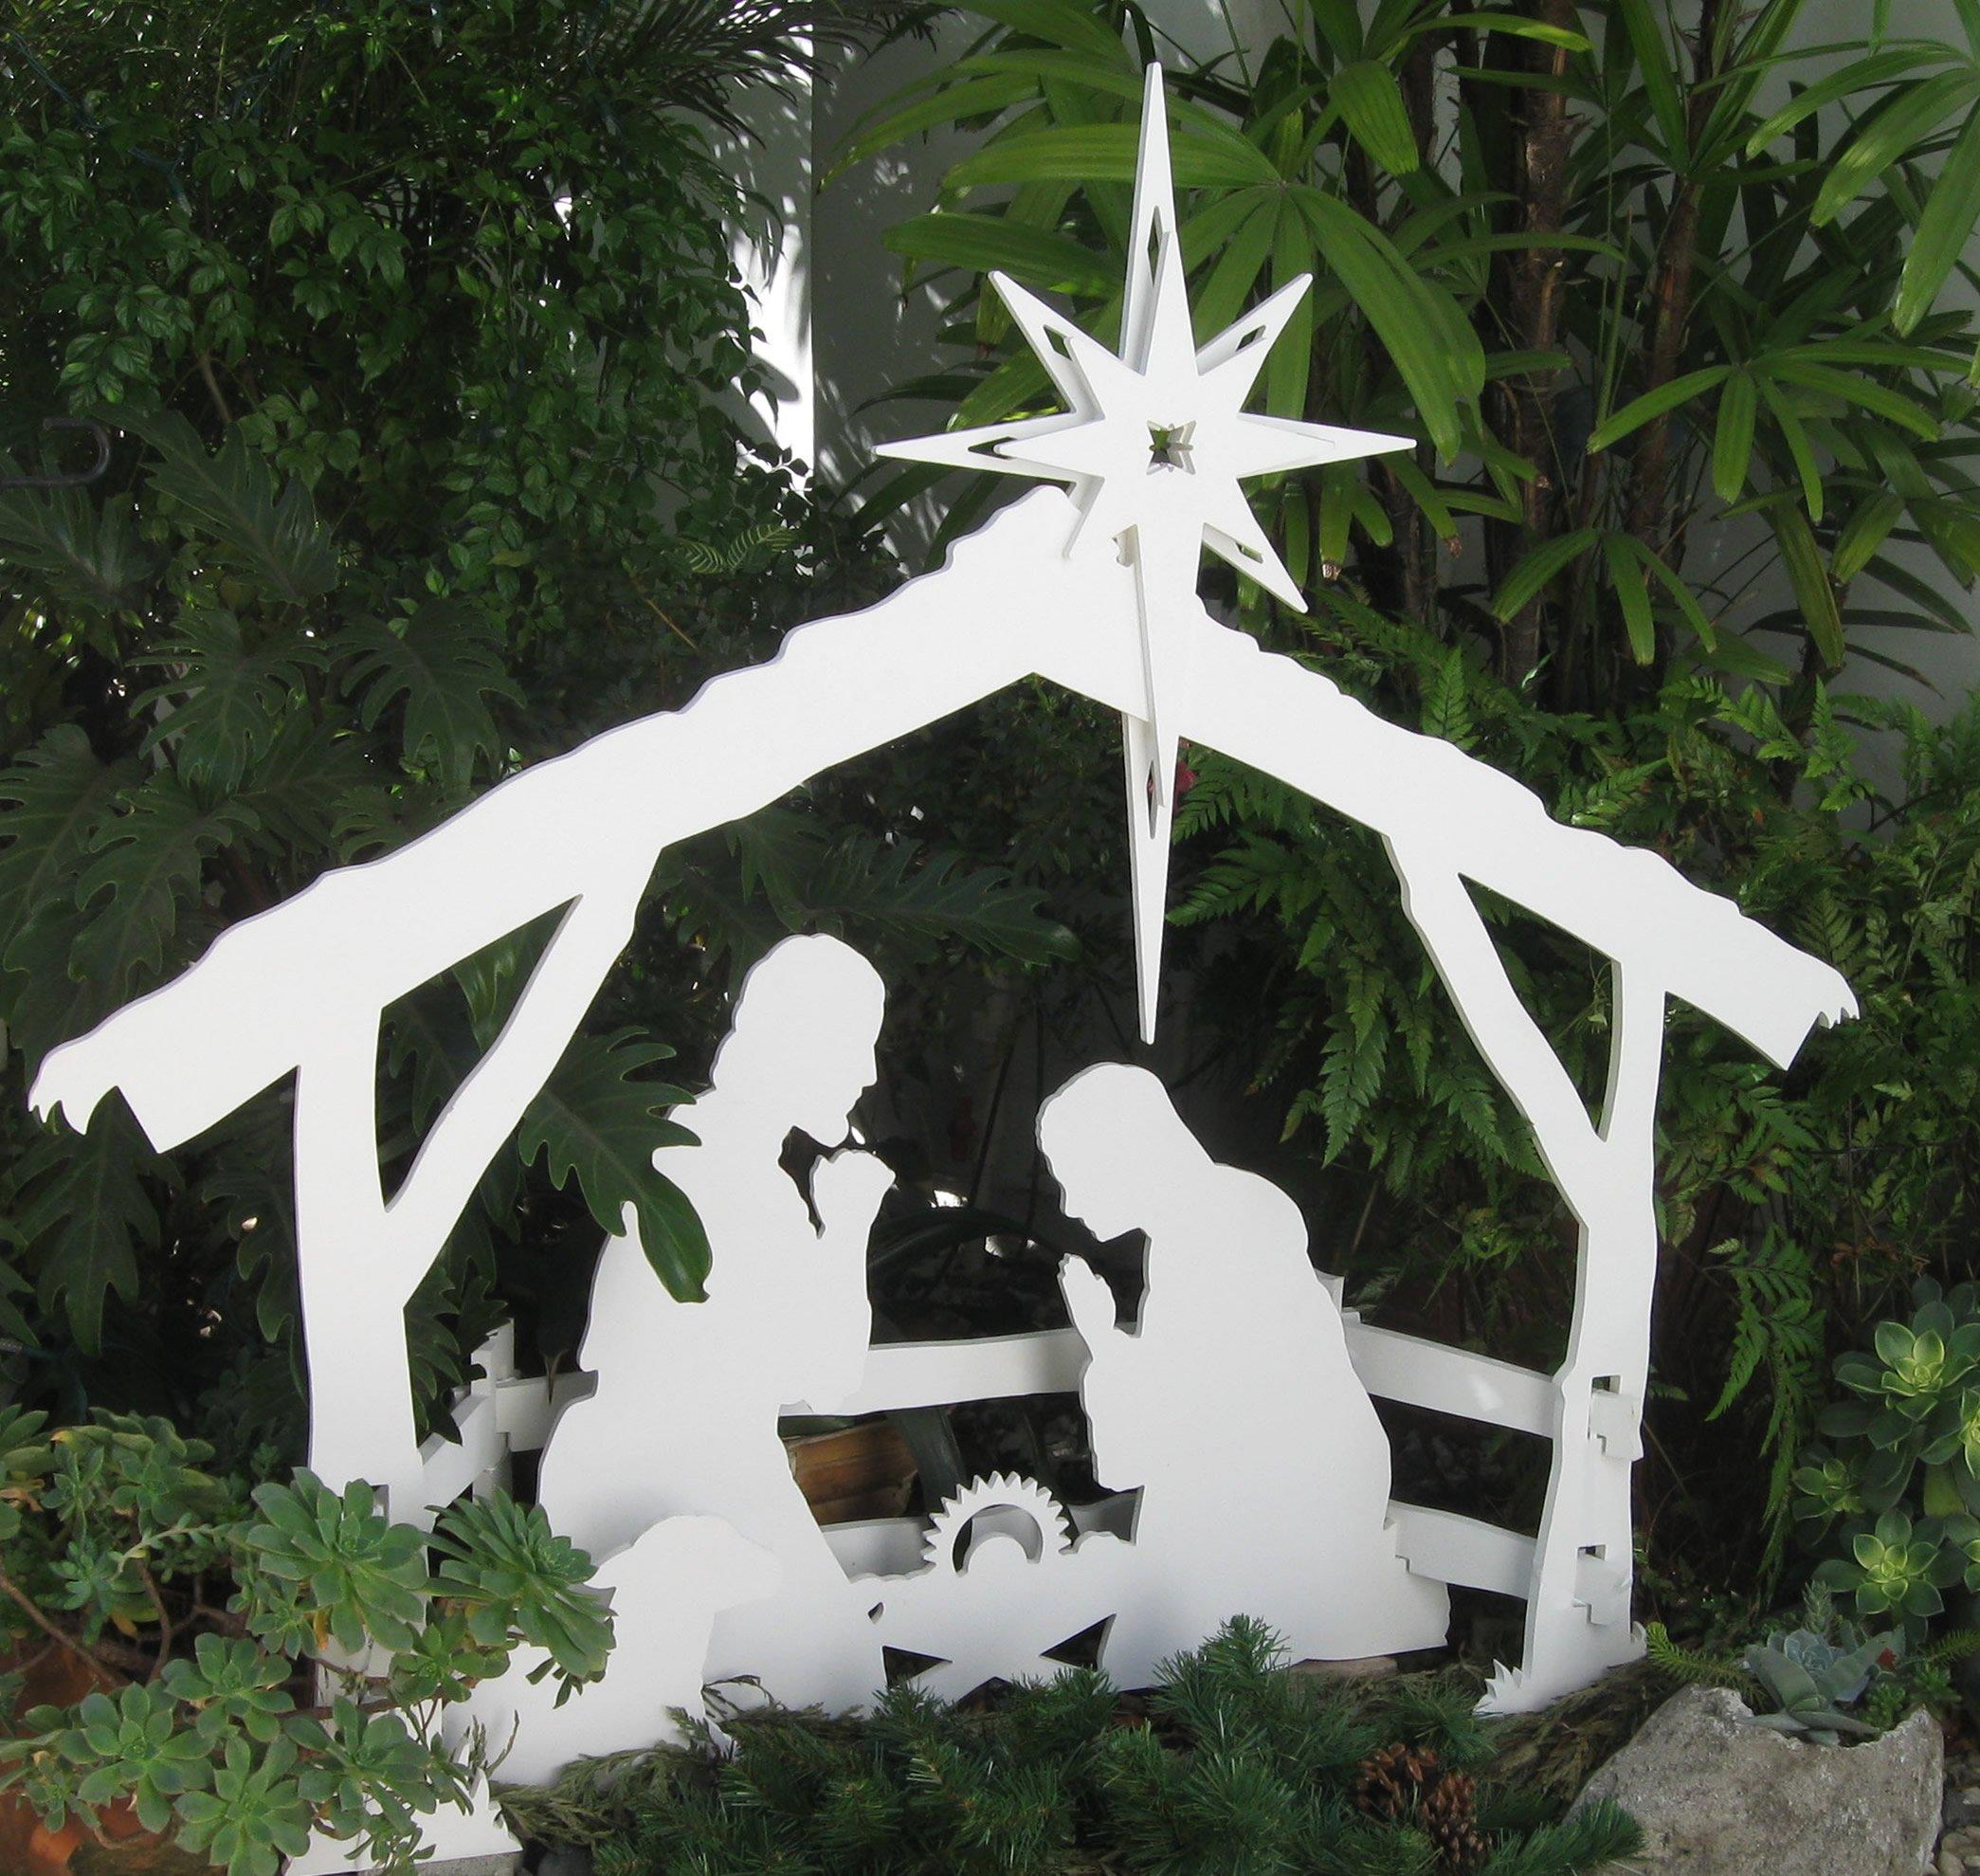 MyNativity Outdoor Christmas Nativity Set, Medium by MyNativity